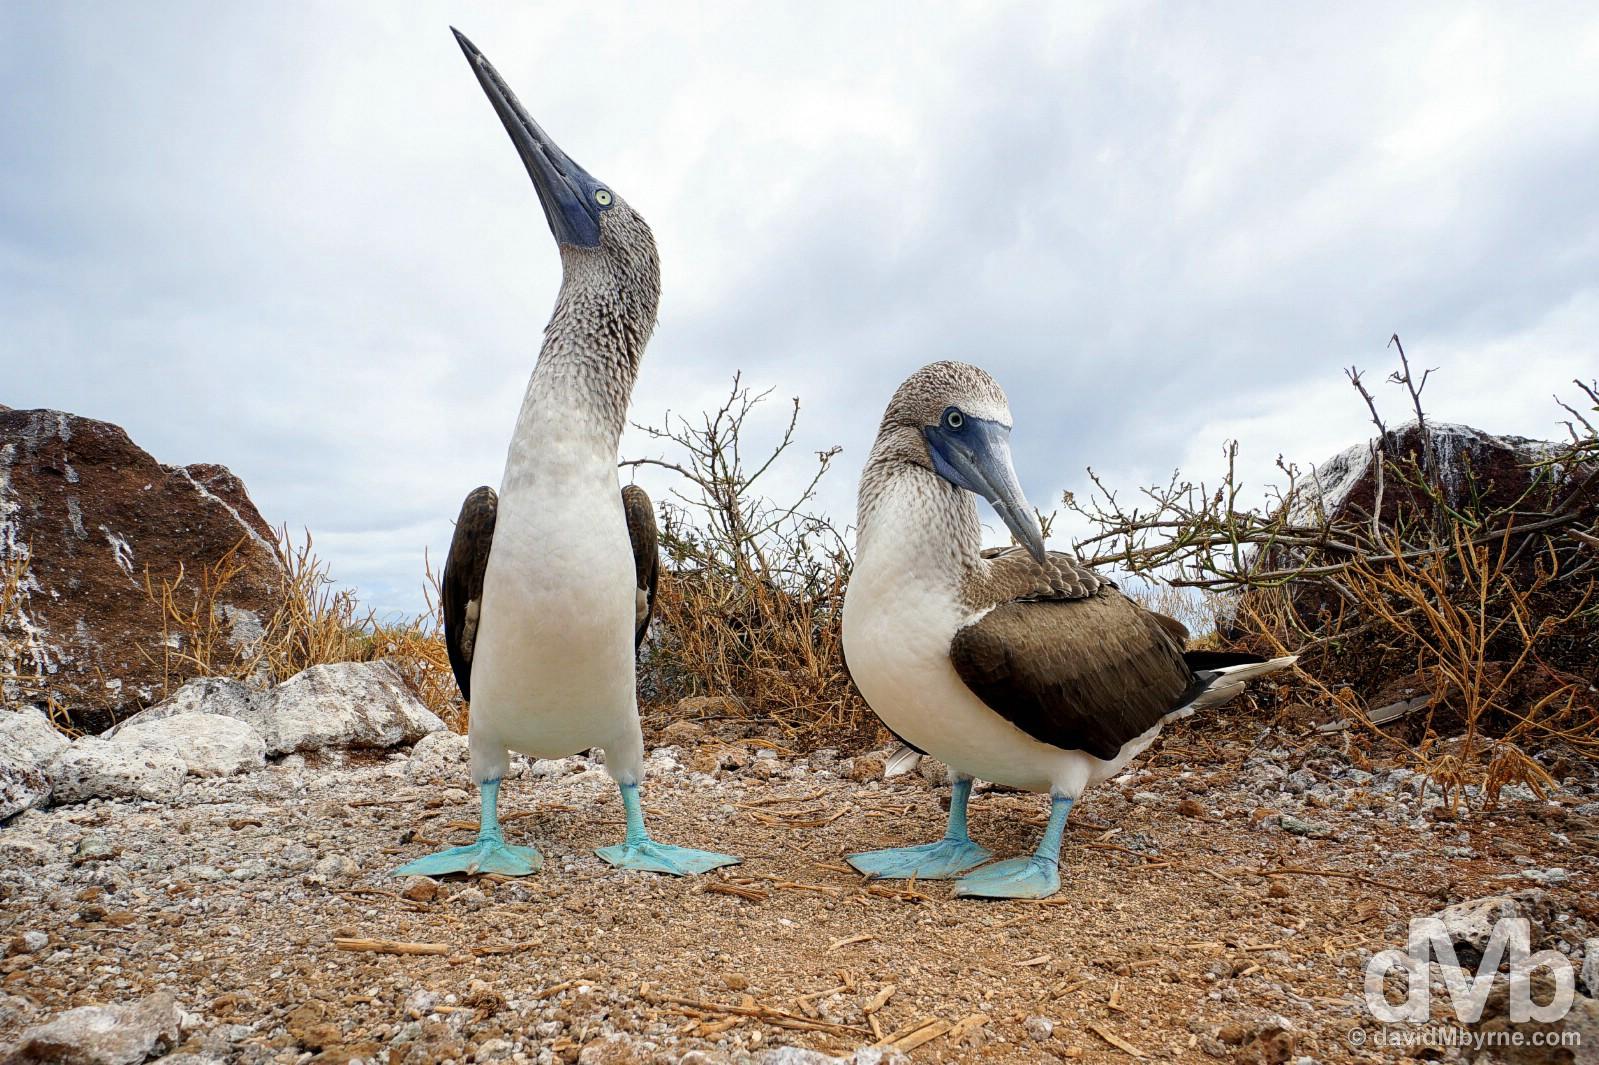 A pair of blue-footed boobies on Isla Seymour Norte, Galapagos, Ecuador. July 18, 2015.